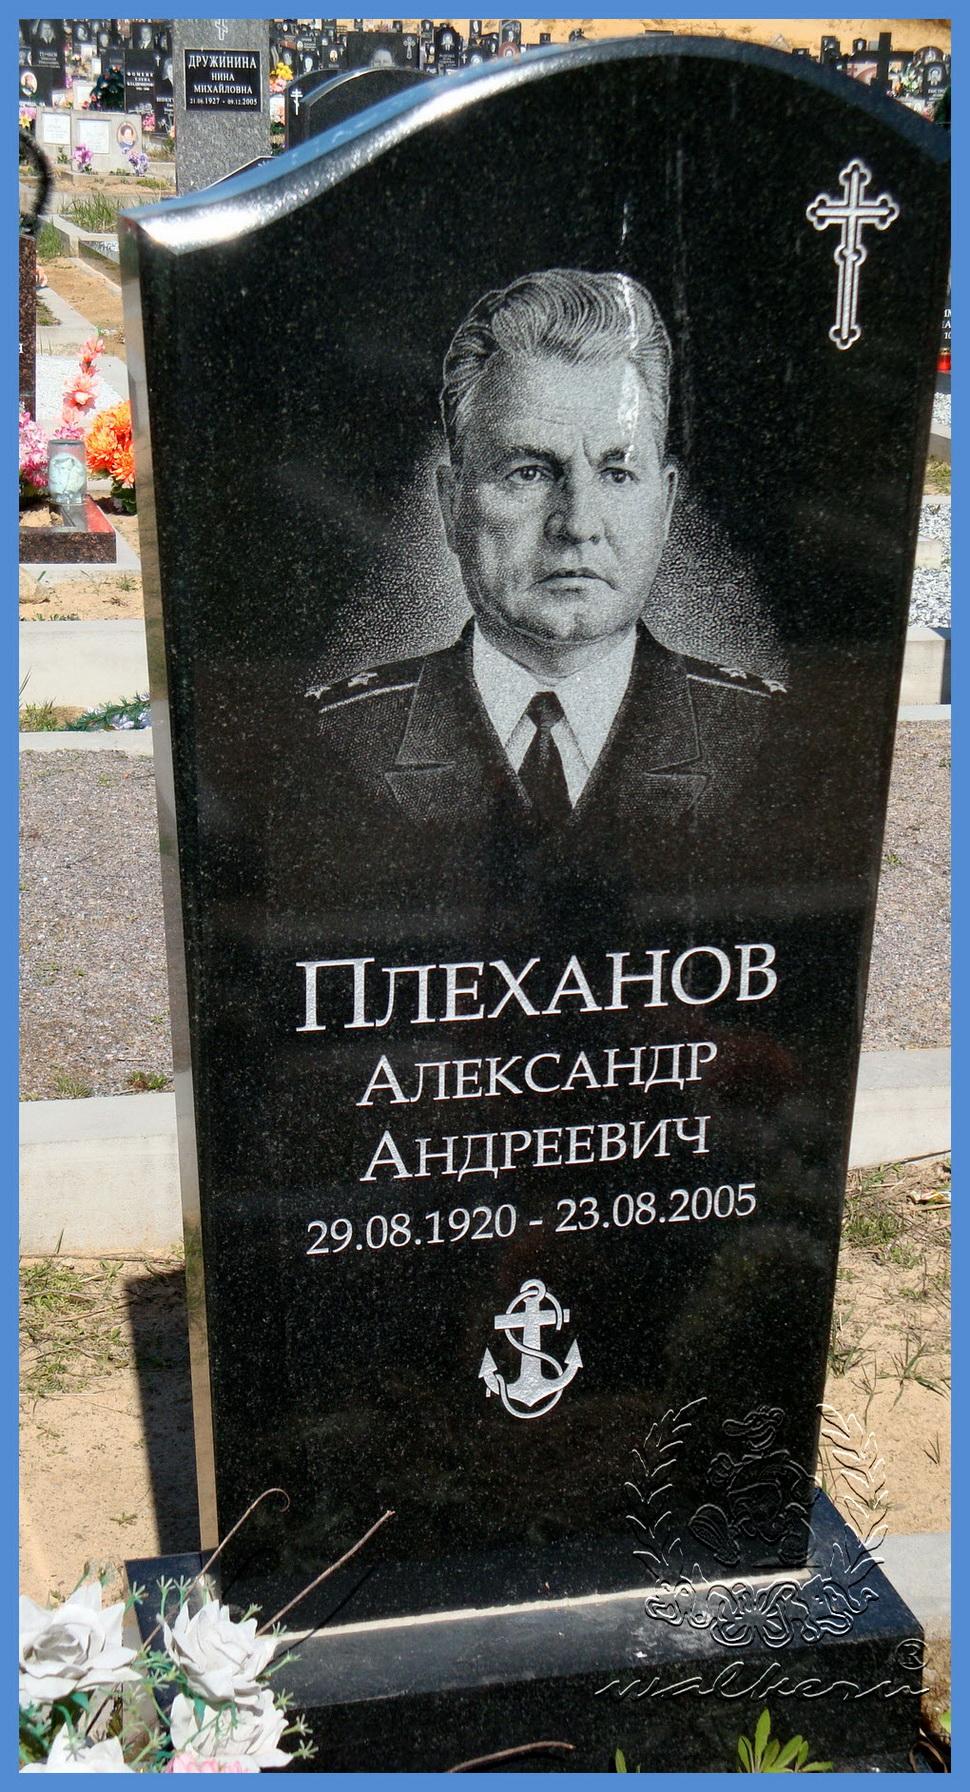 Плеханов Александр Андреевич